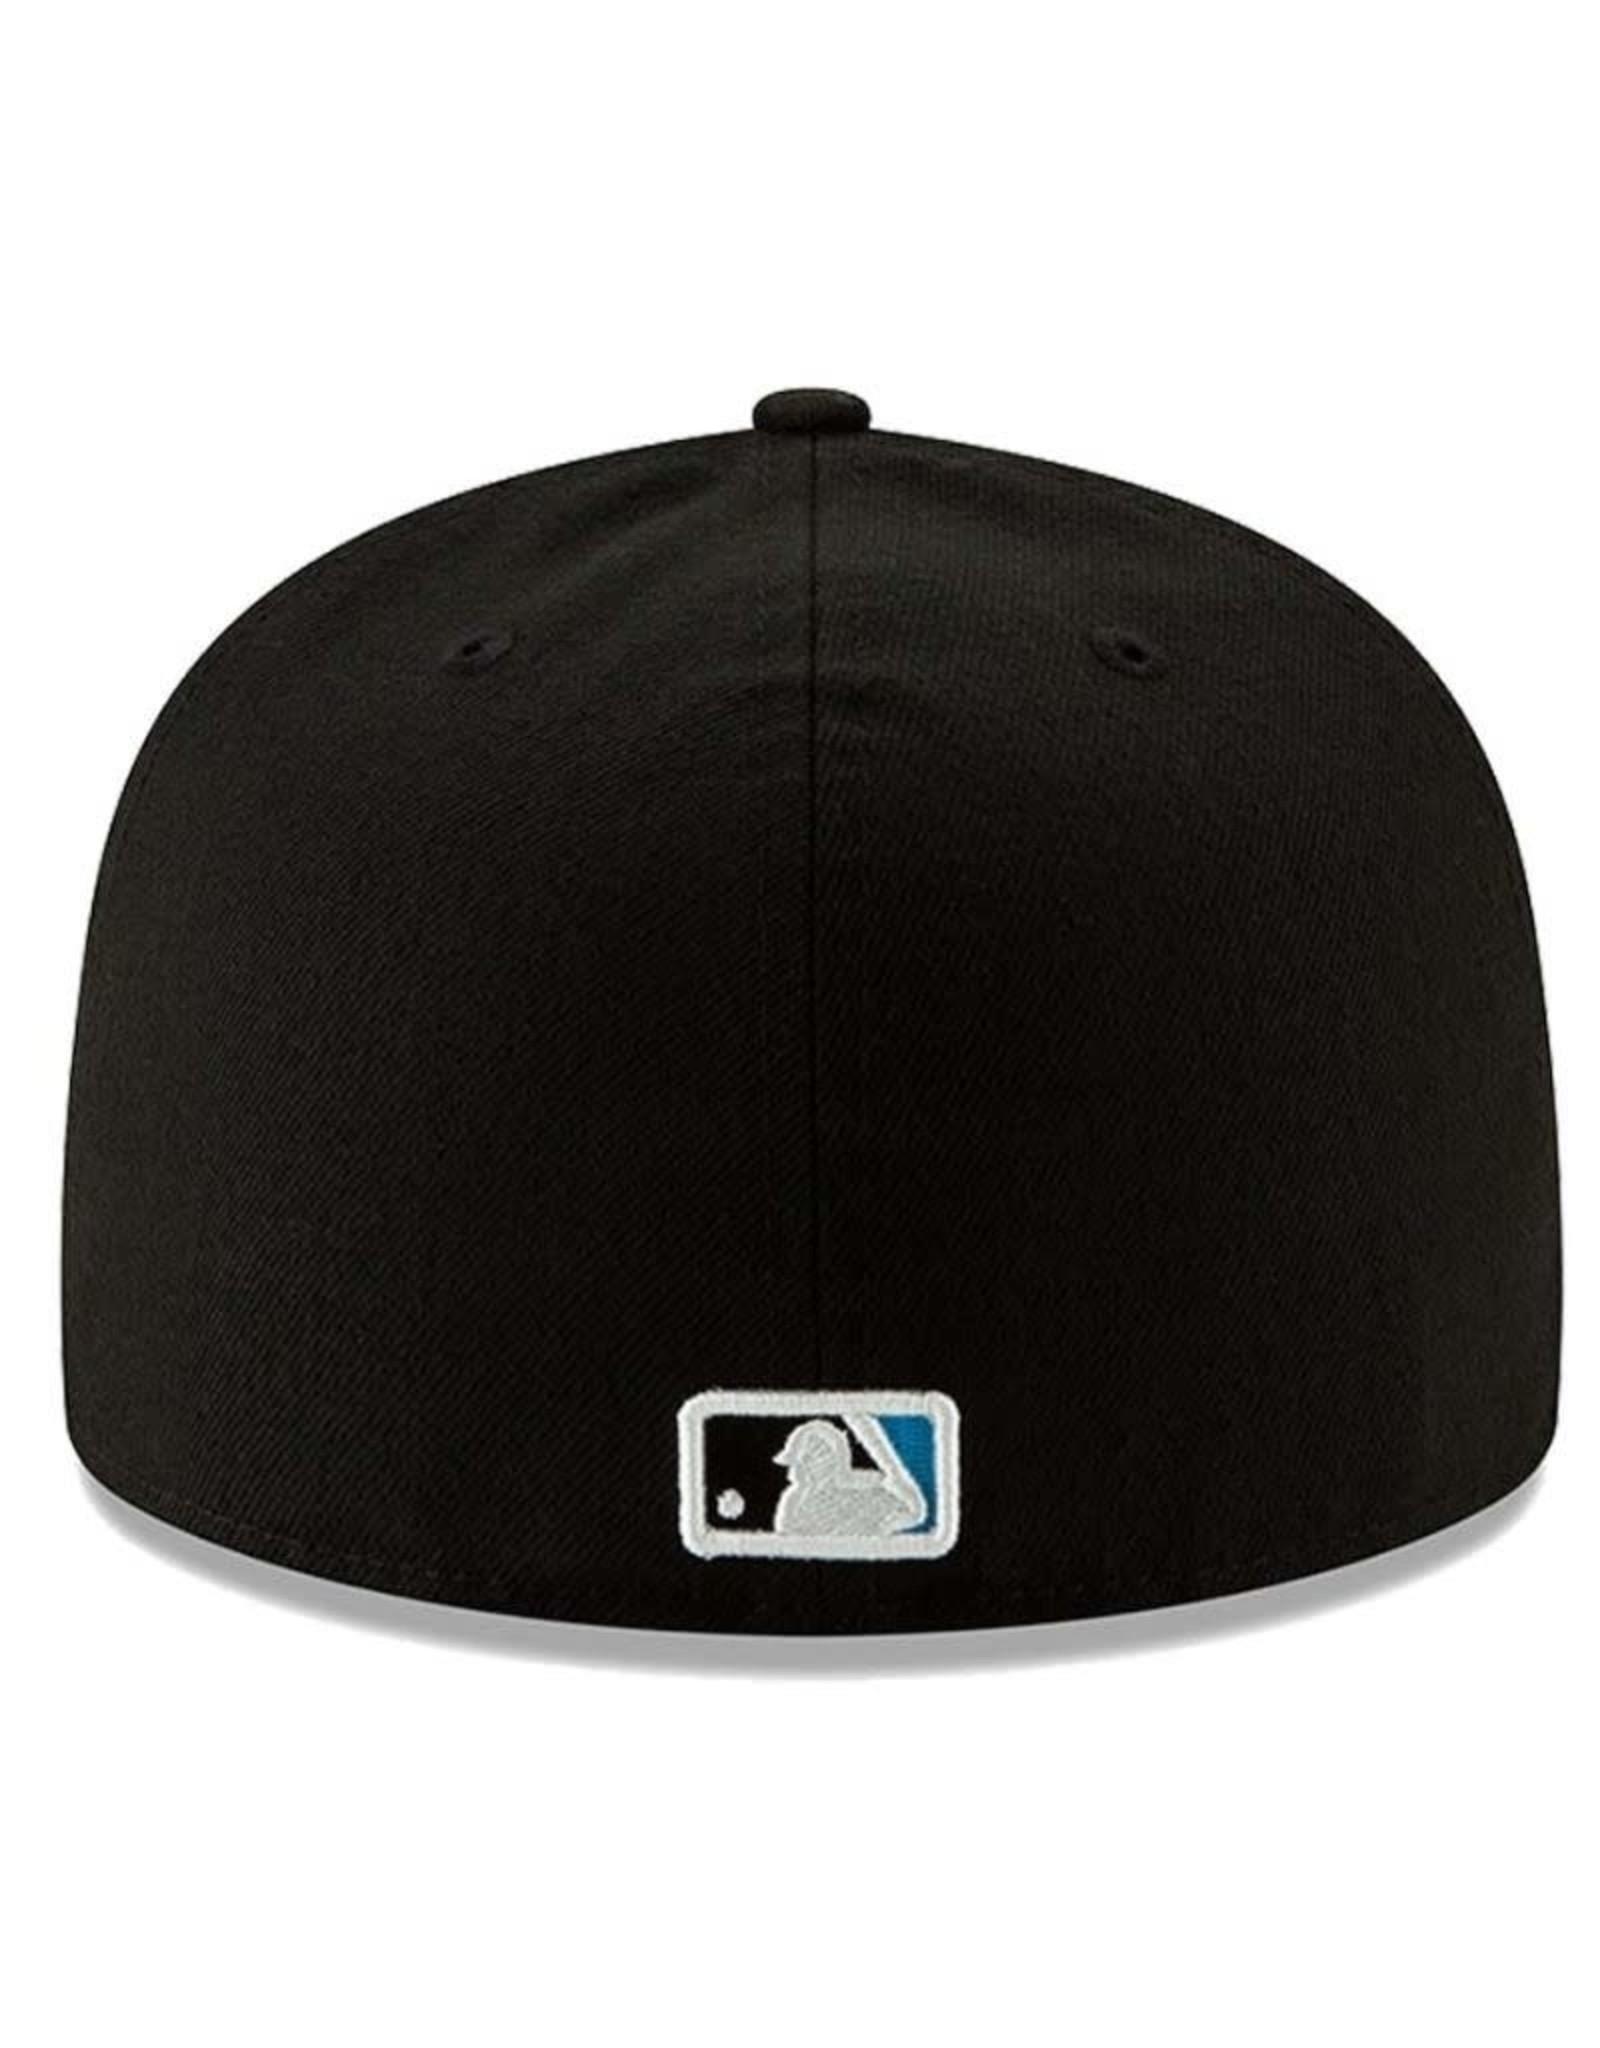 New Era On-Field Home Hat Miami Marlins Black